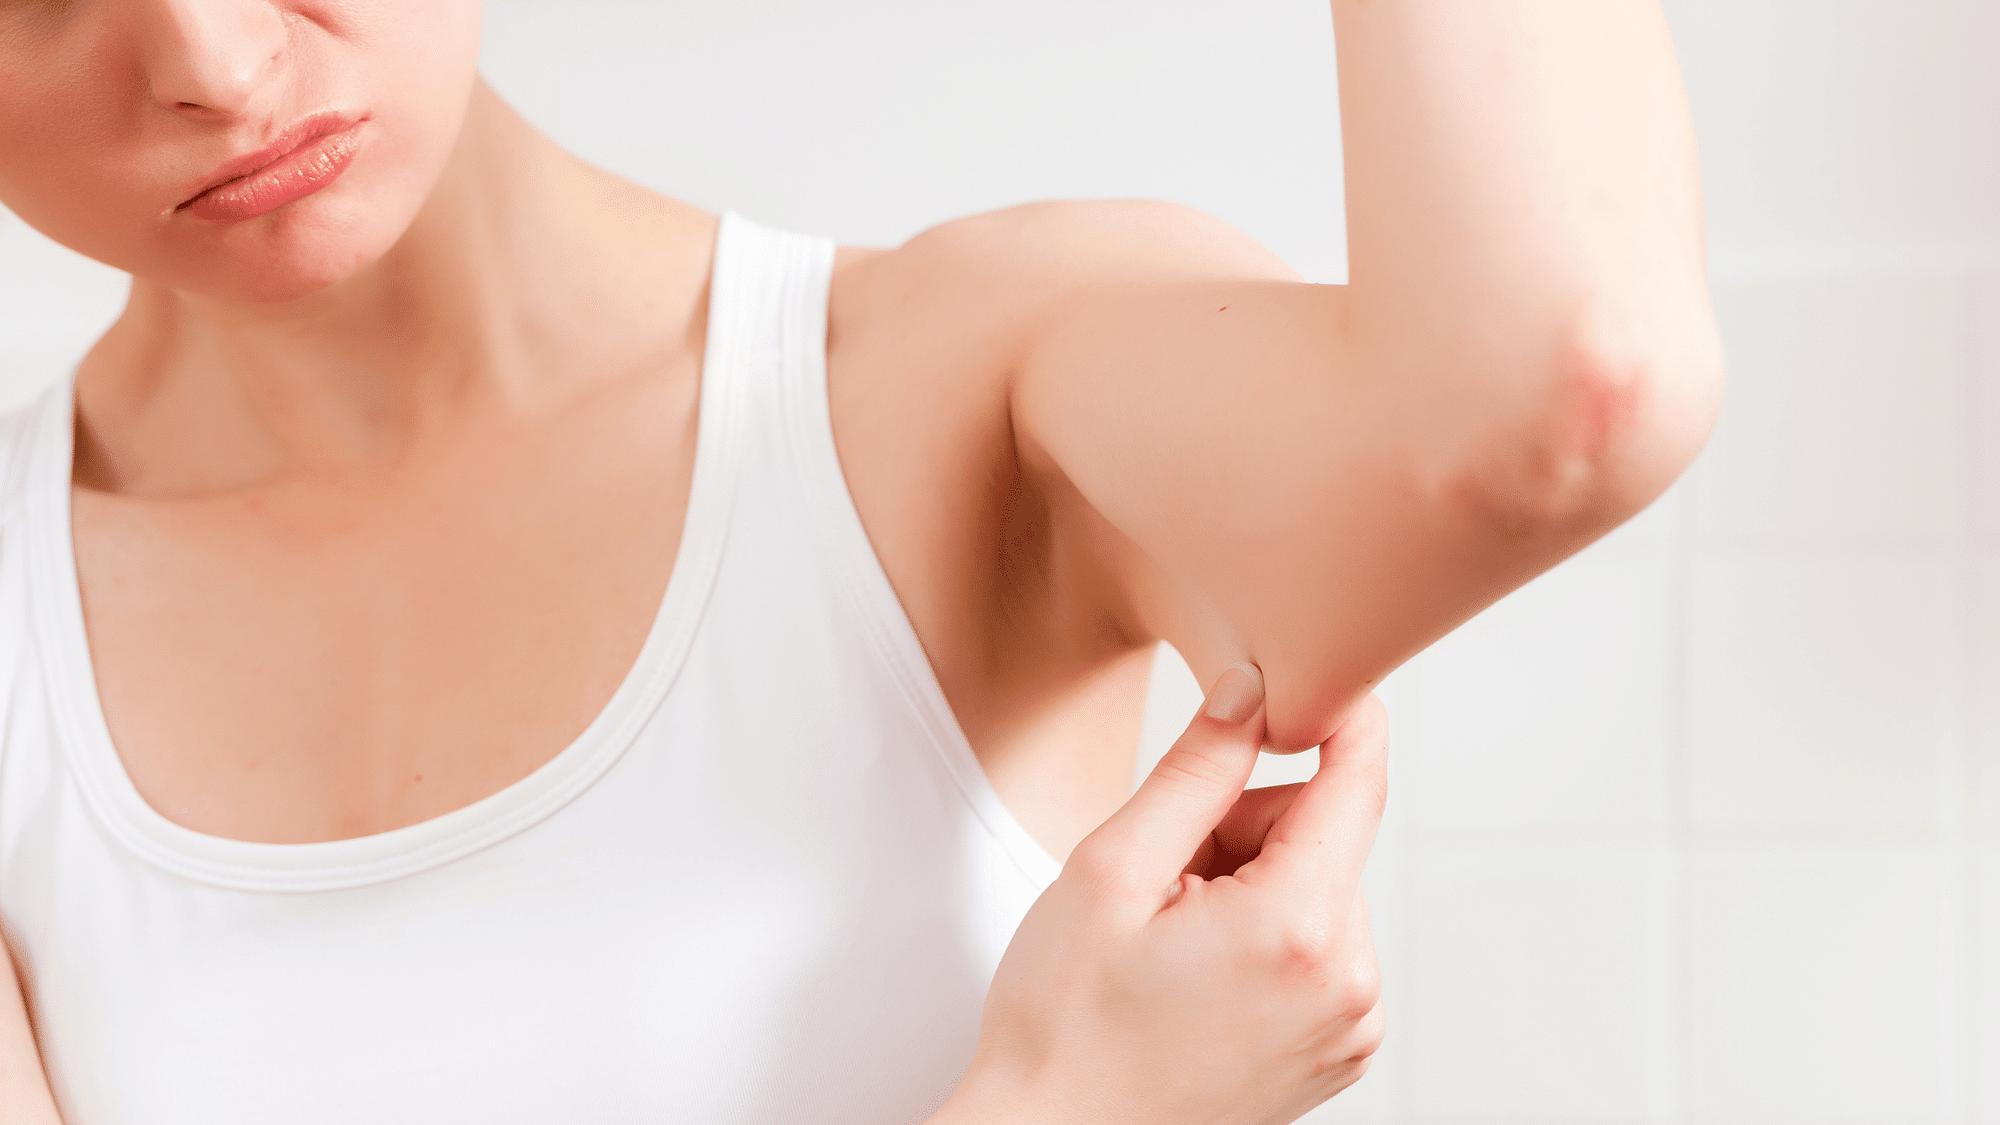 triceps upper arm fat